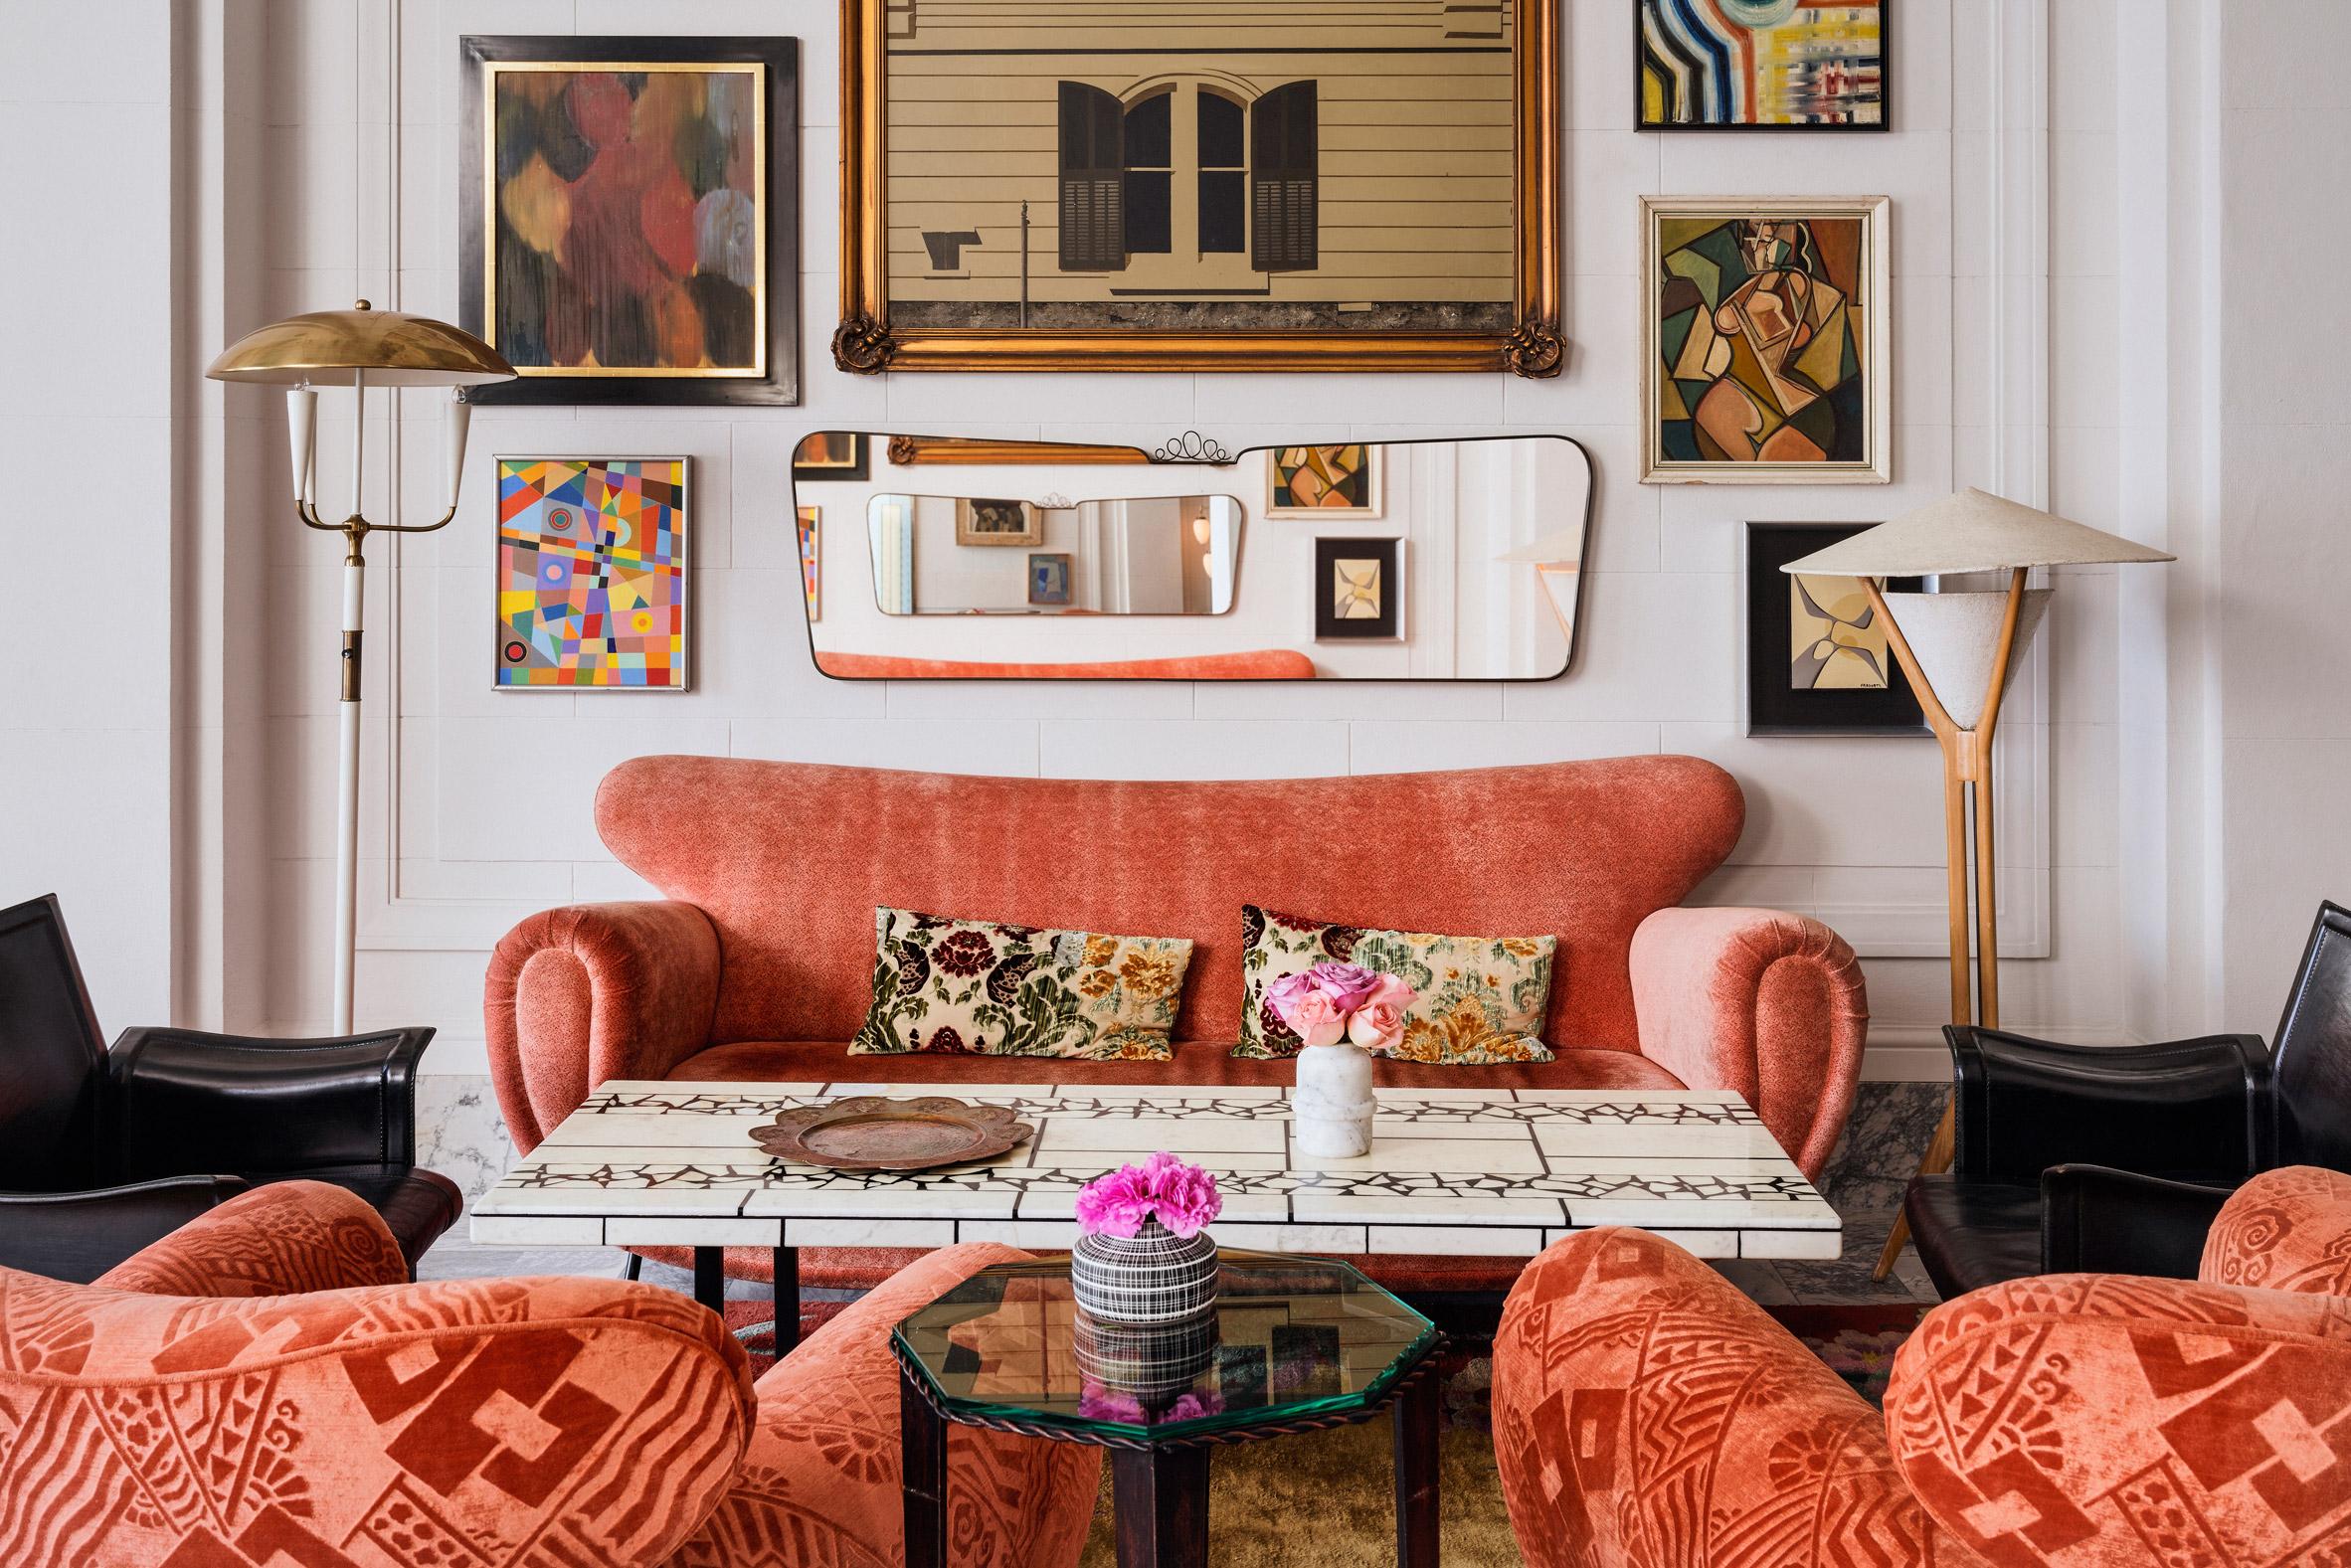 san-francisco-proper-kelly-wearstler-interiors-hotel-california-usa_dezeen_2364_col_24.jpg